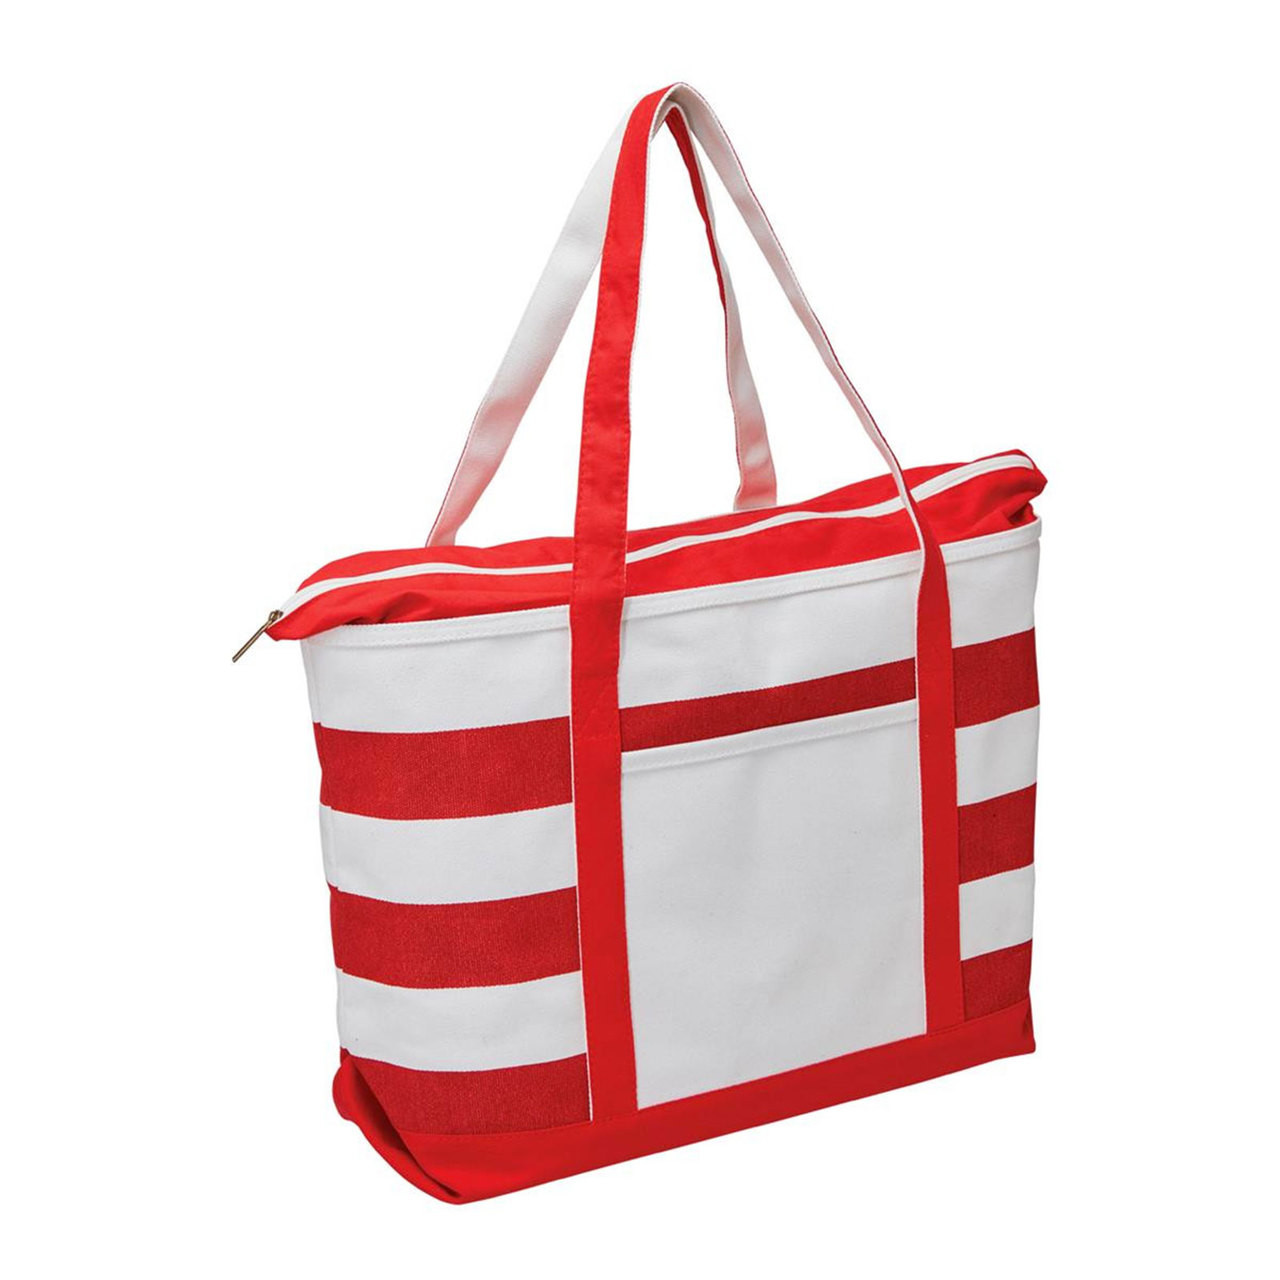 746e69c27 Wholesale Premium Canvas Striped Tote | Bulk Buy Blank Bags Online